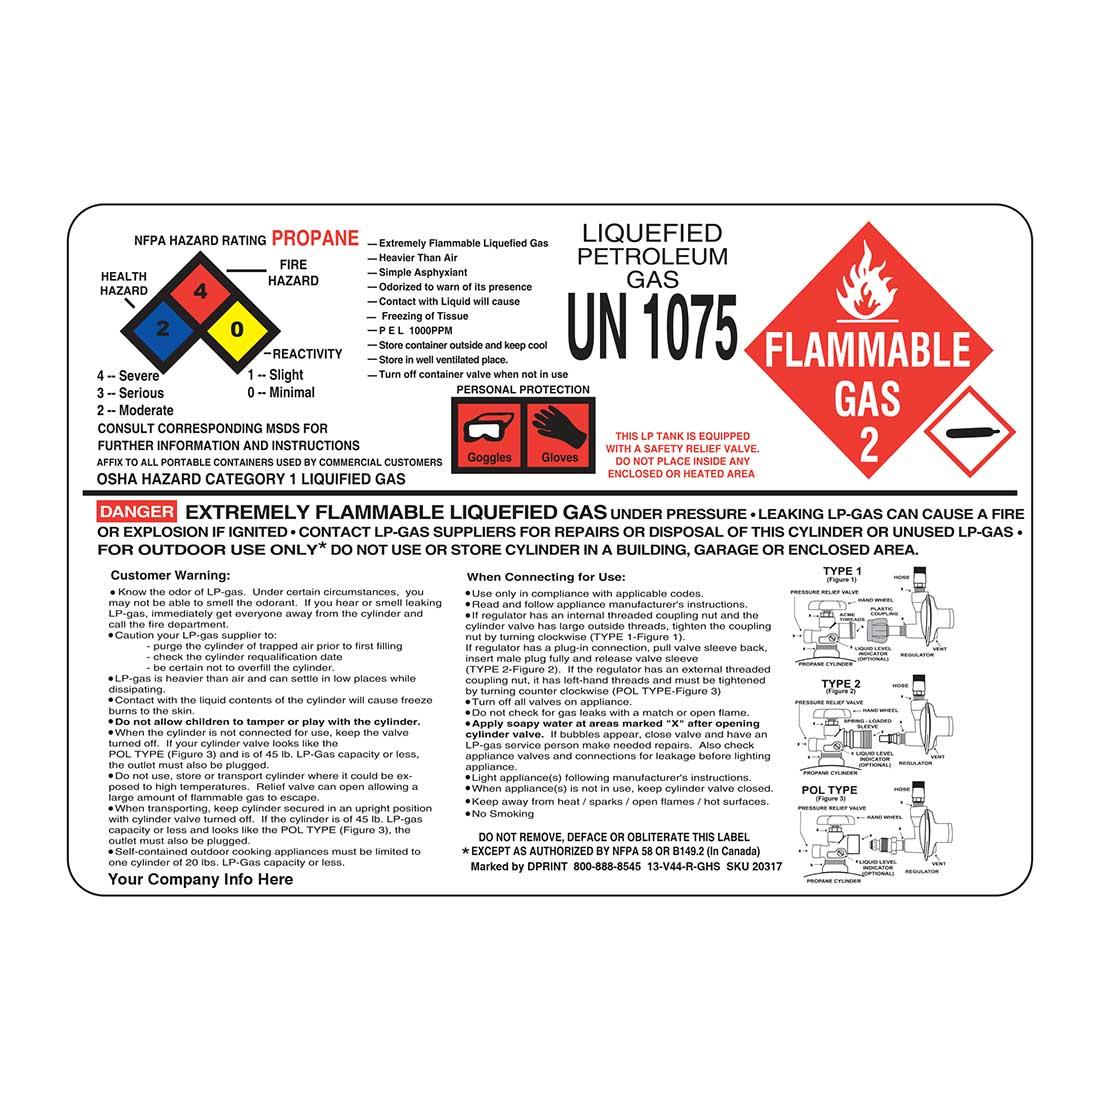 3-in-1 Propane Hazard Label